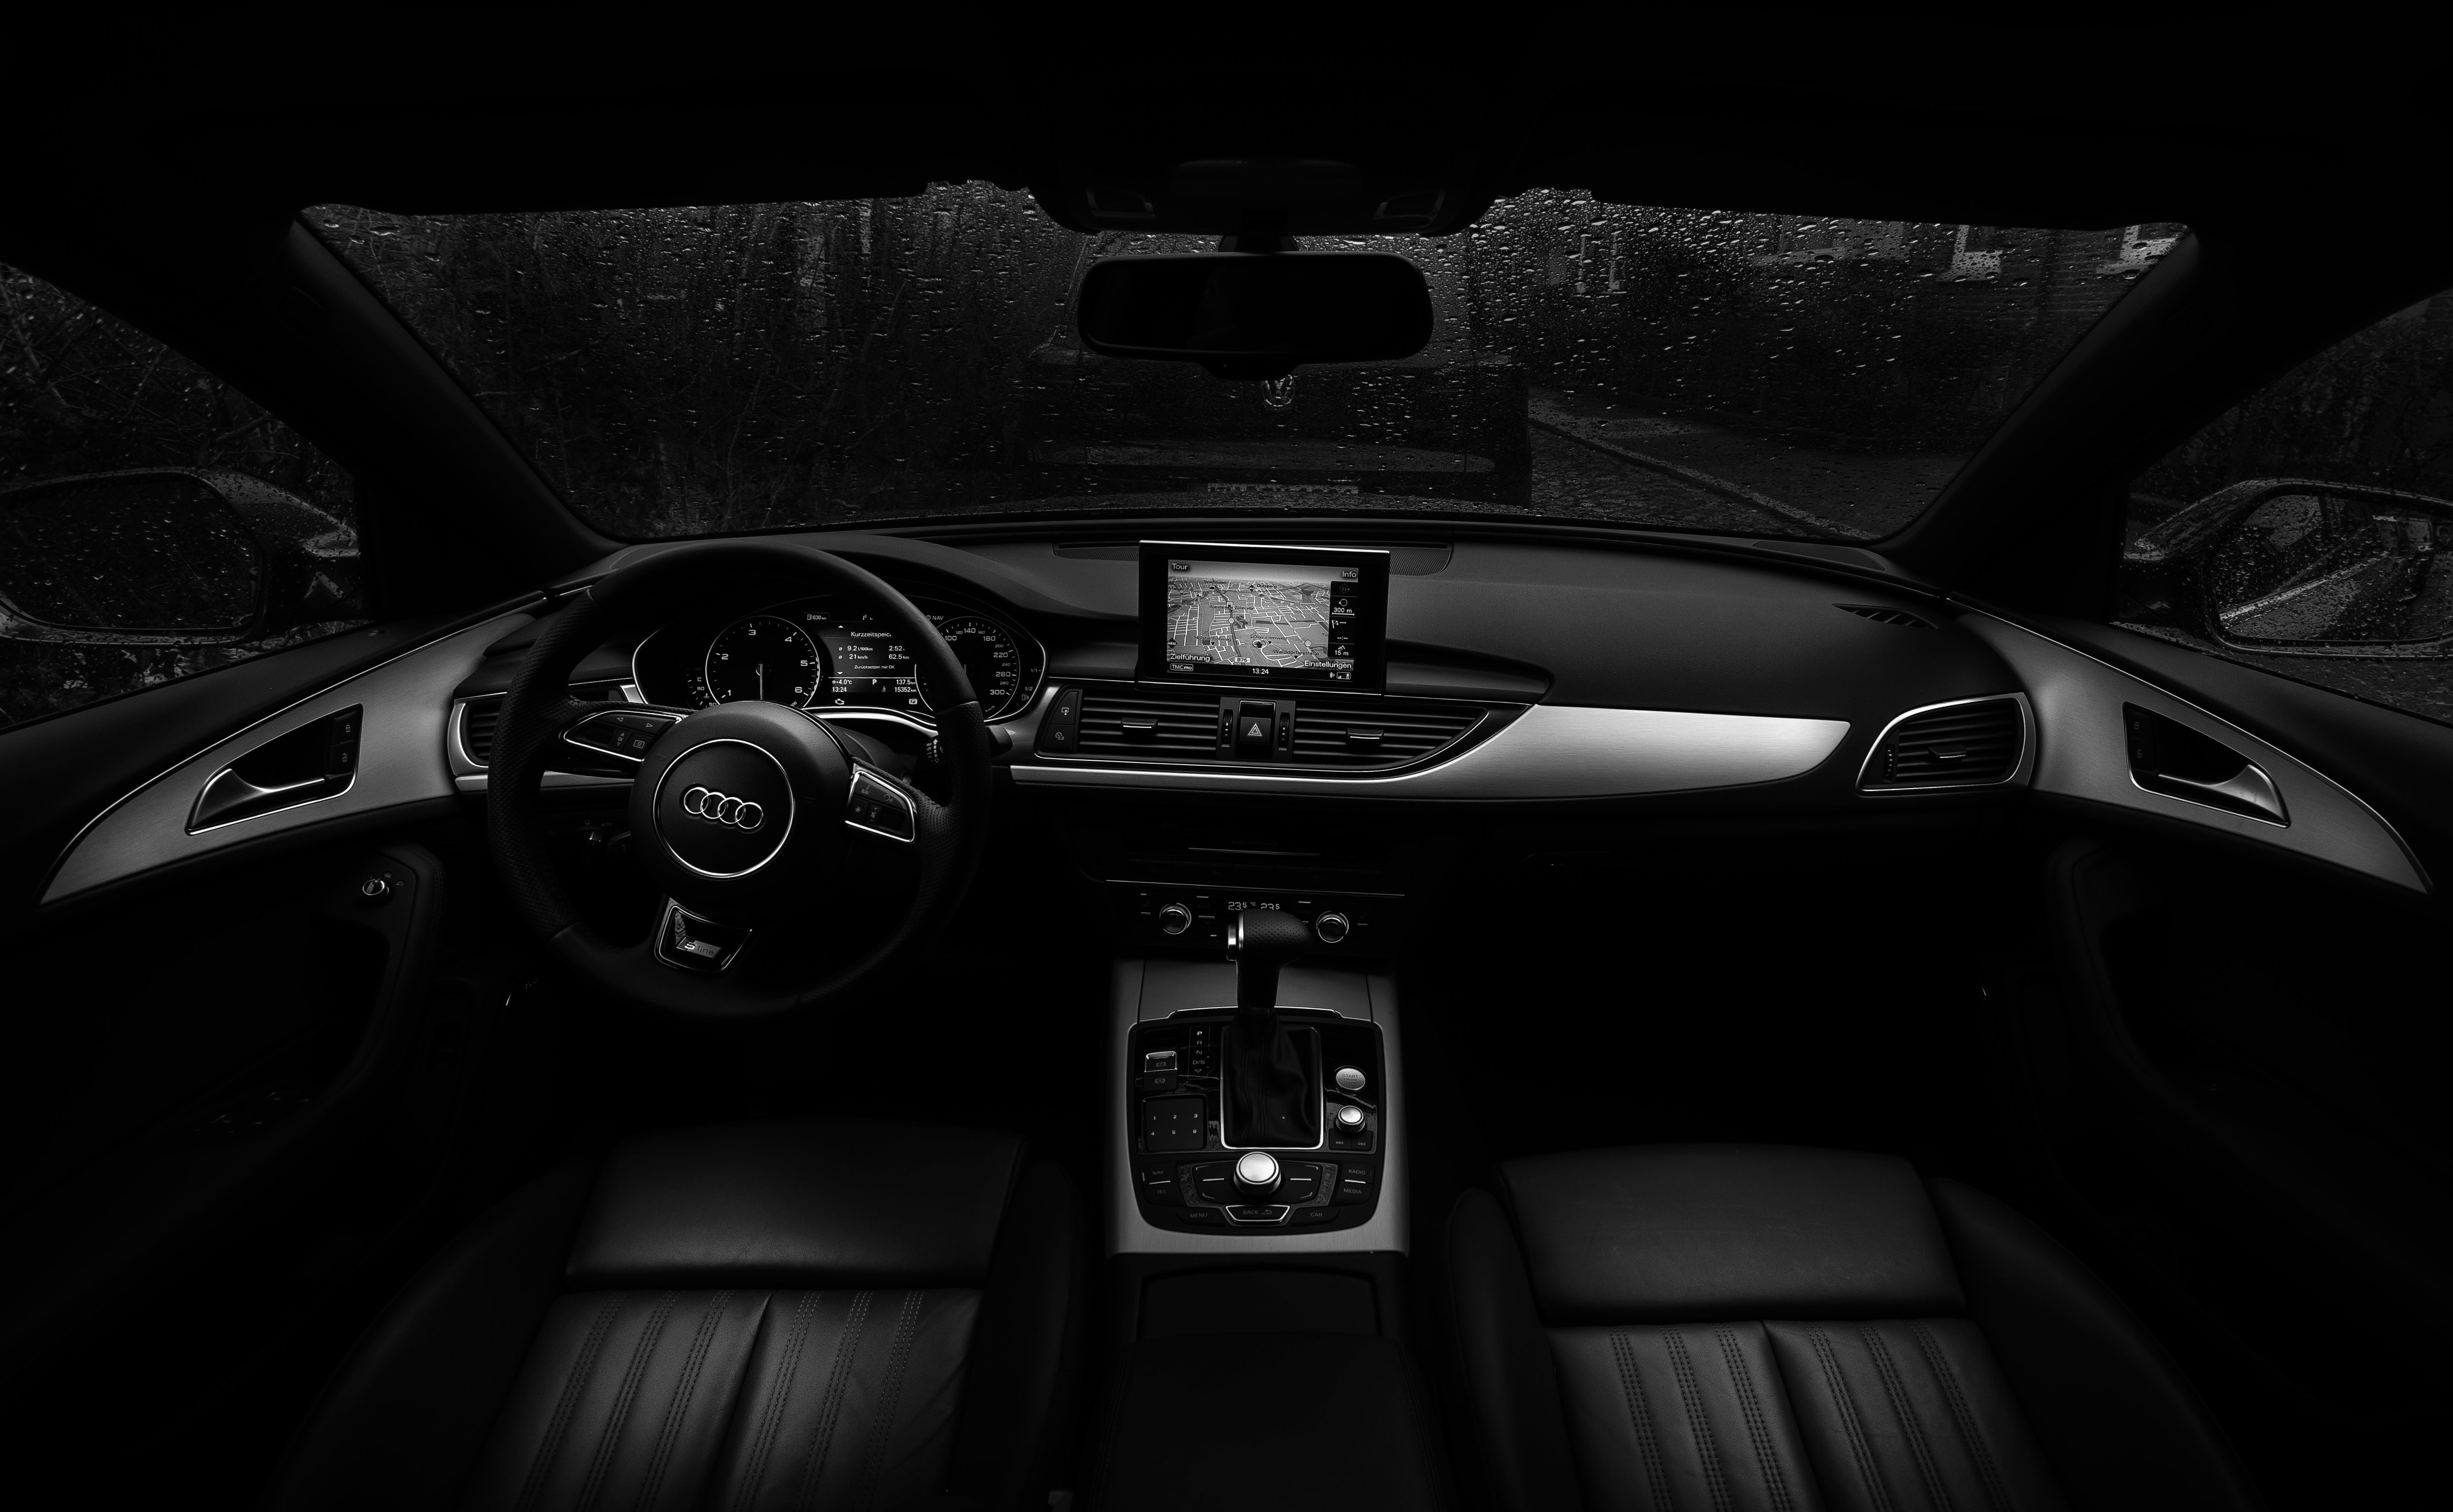 Black Car Interior, Audi, Black, Car, Gear, HQ Photo